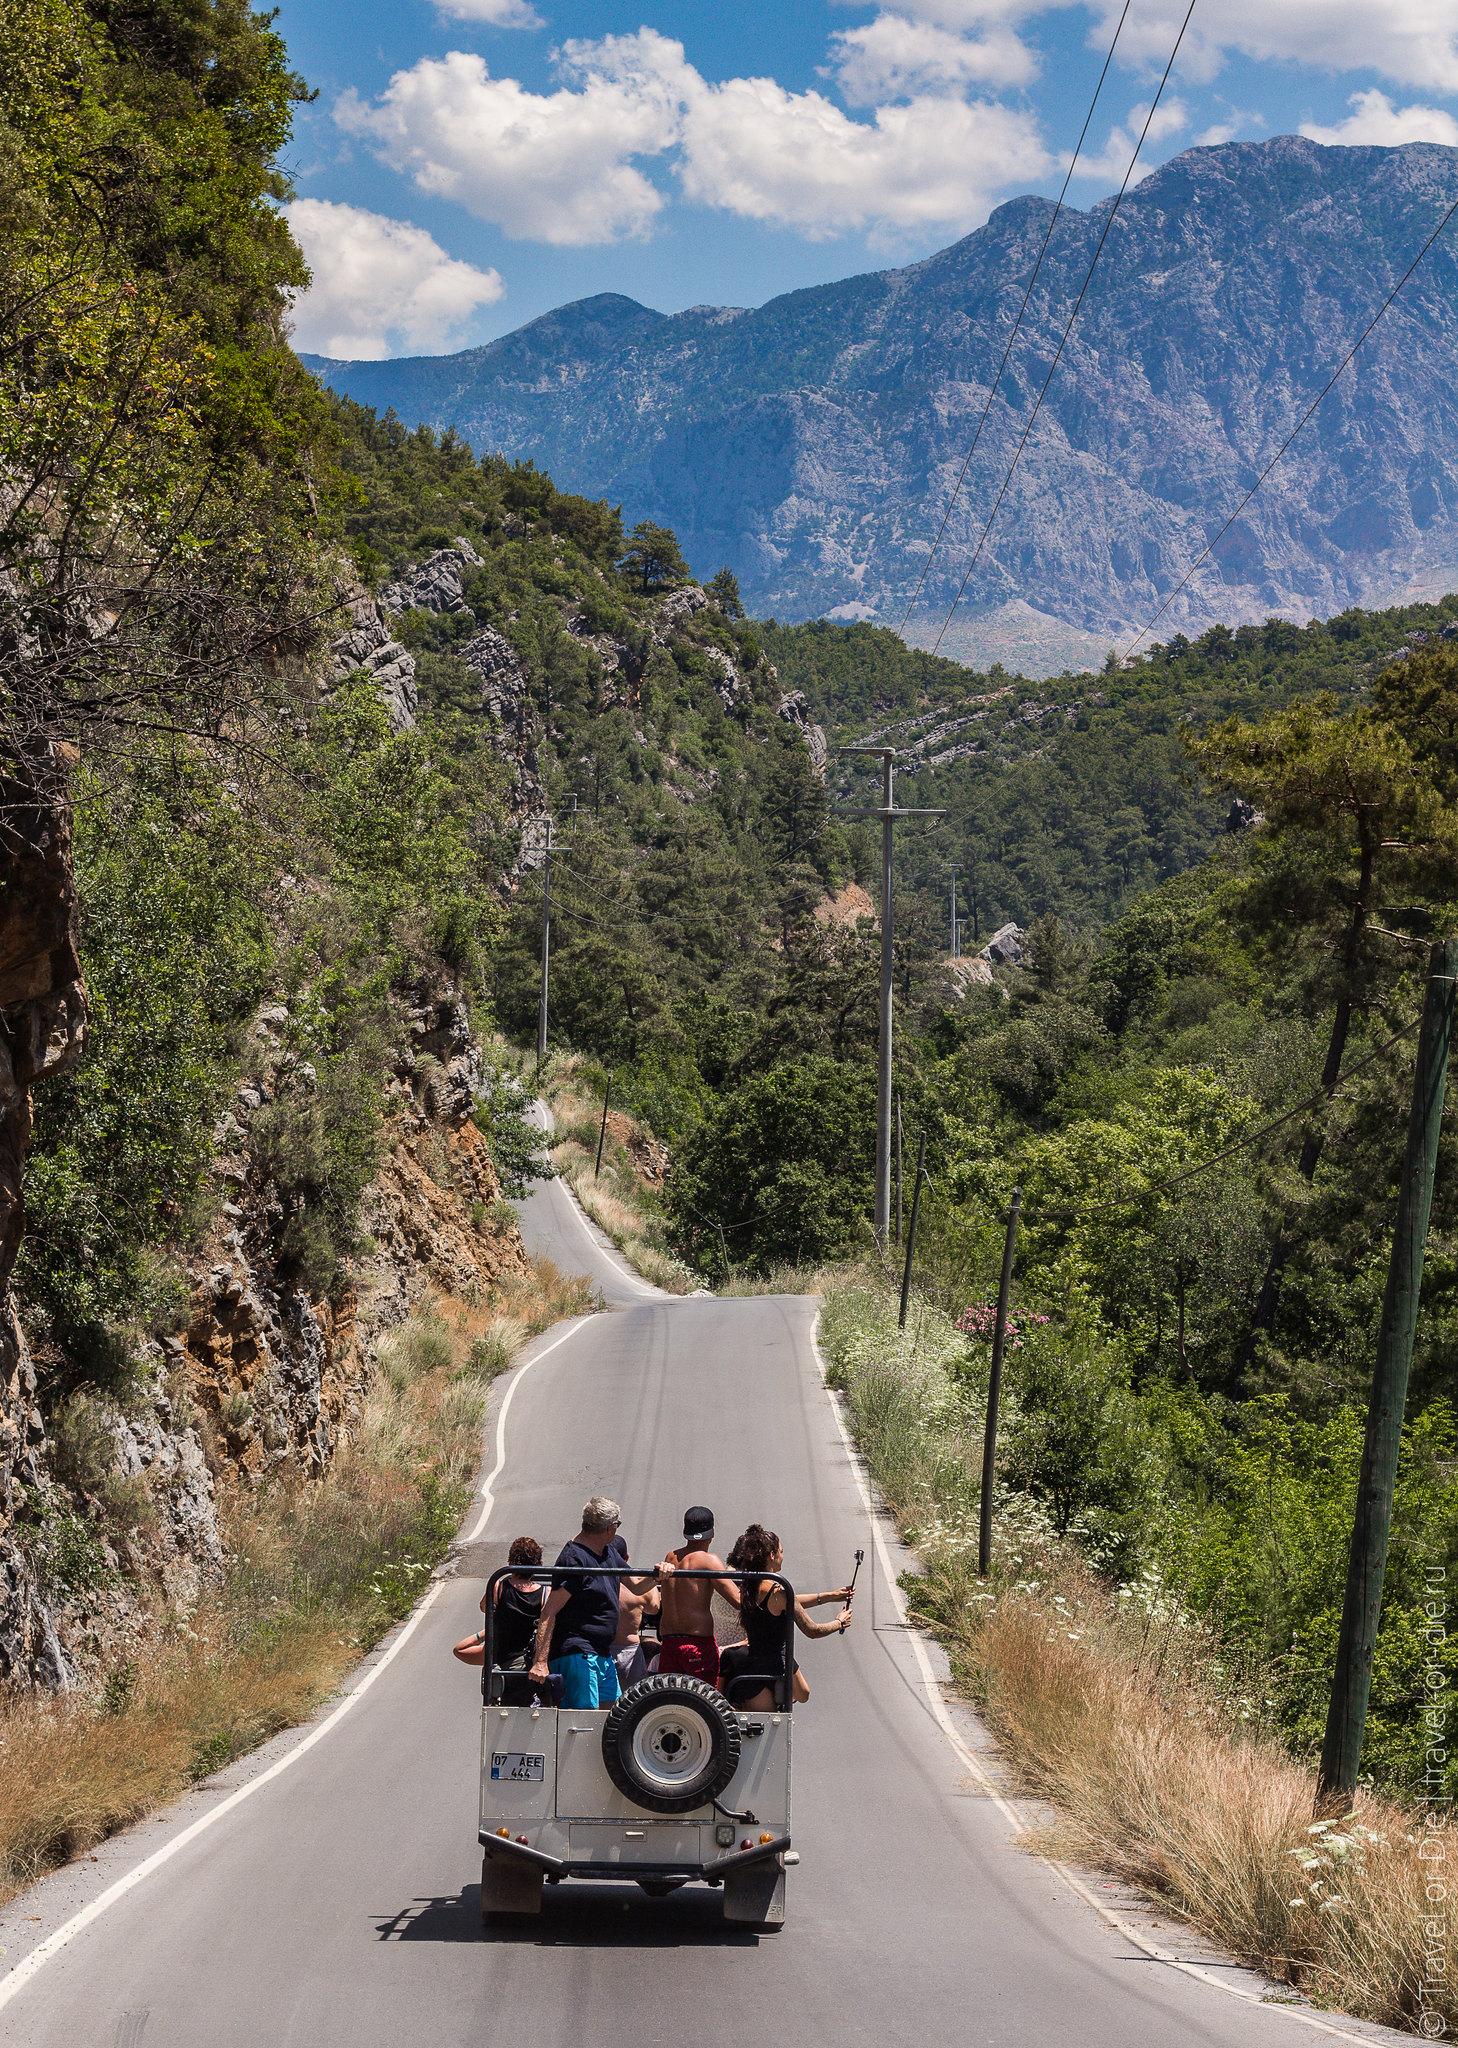 Sapadere-Canyon-Tour-экскурсия-в-каньон-сападере-6208